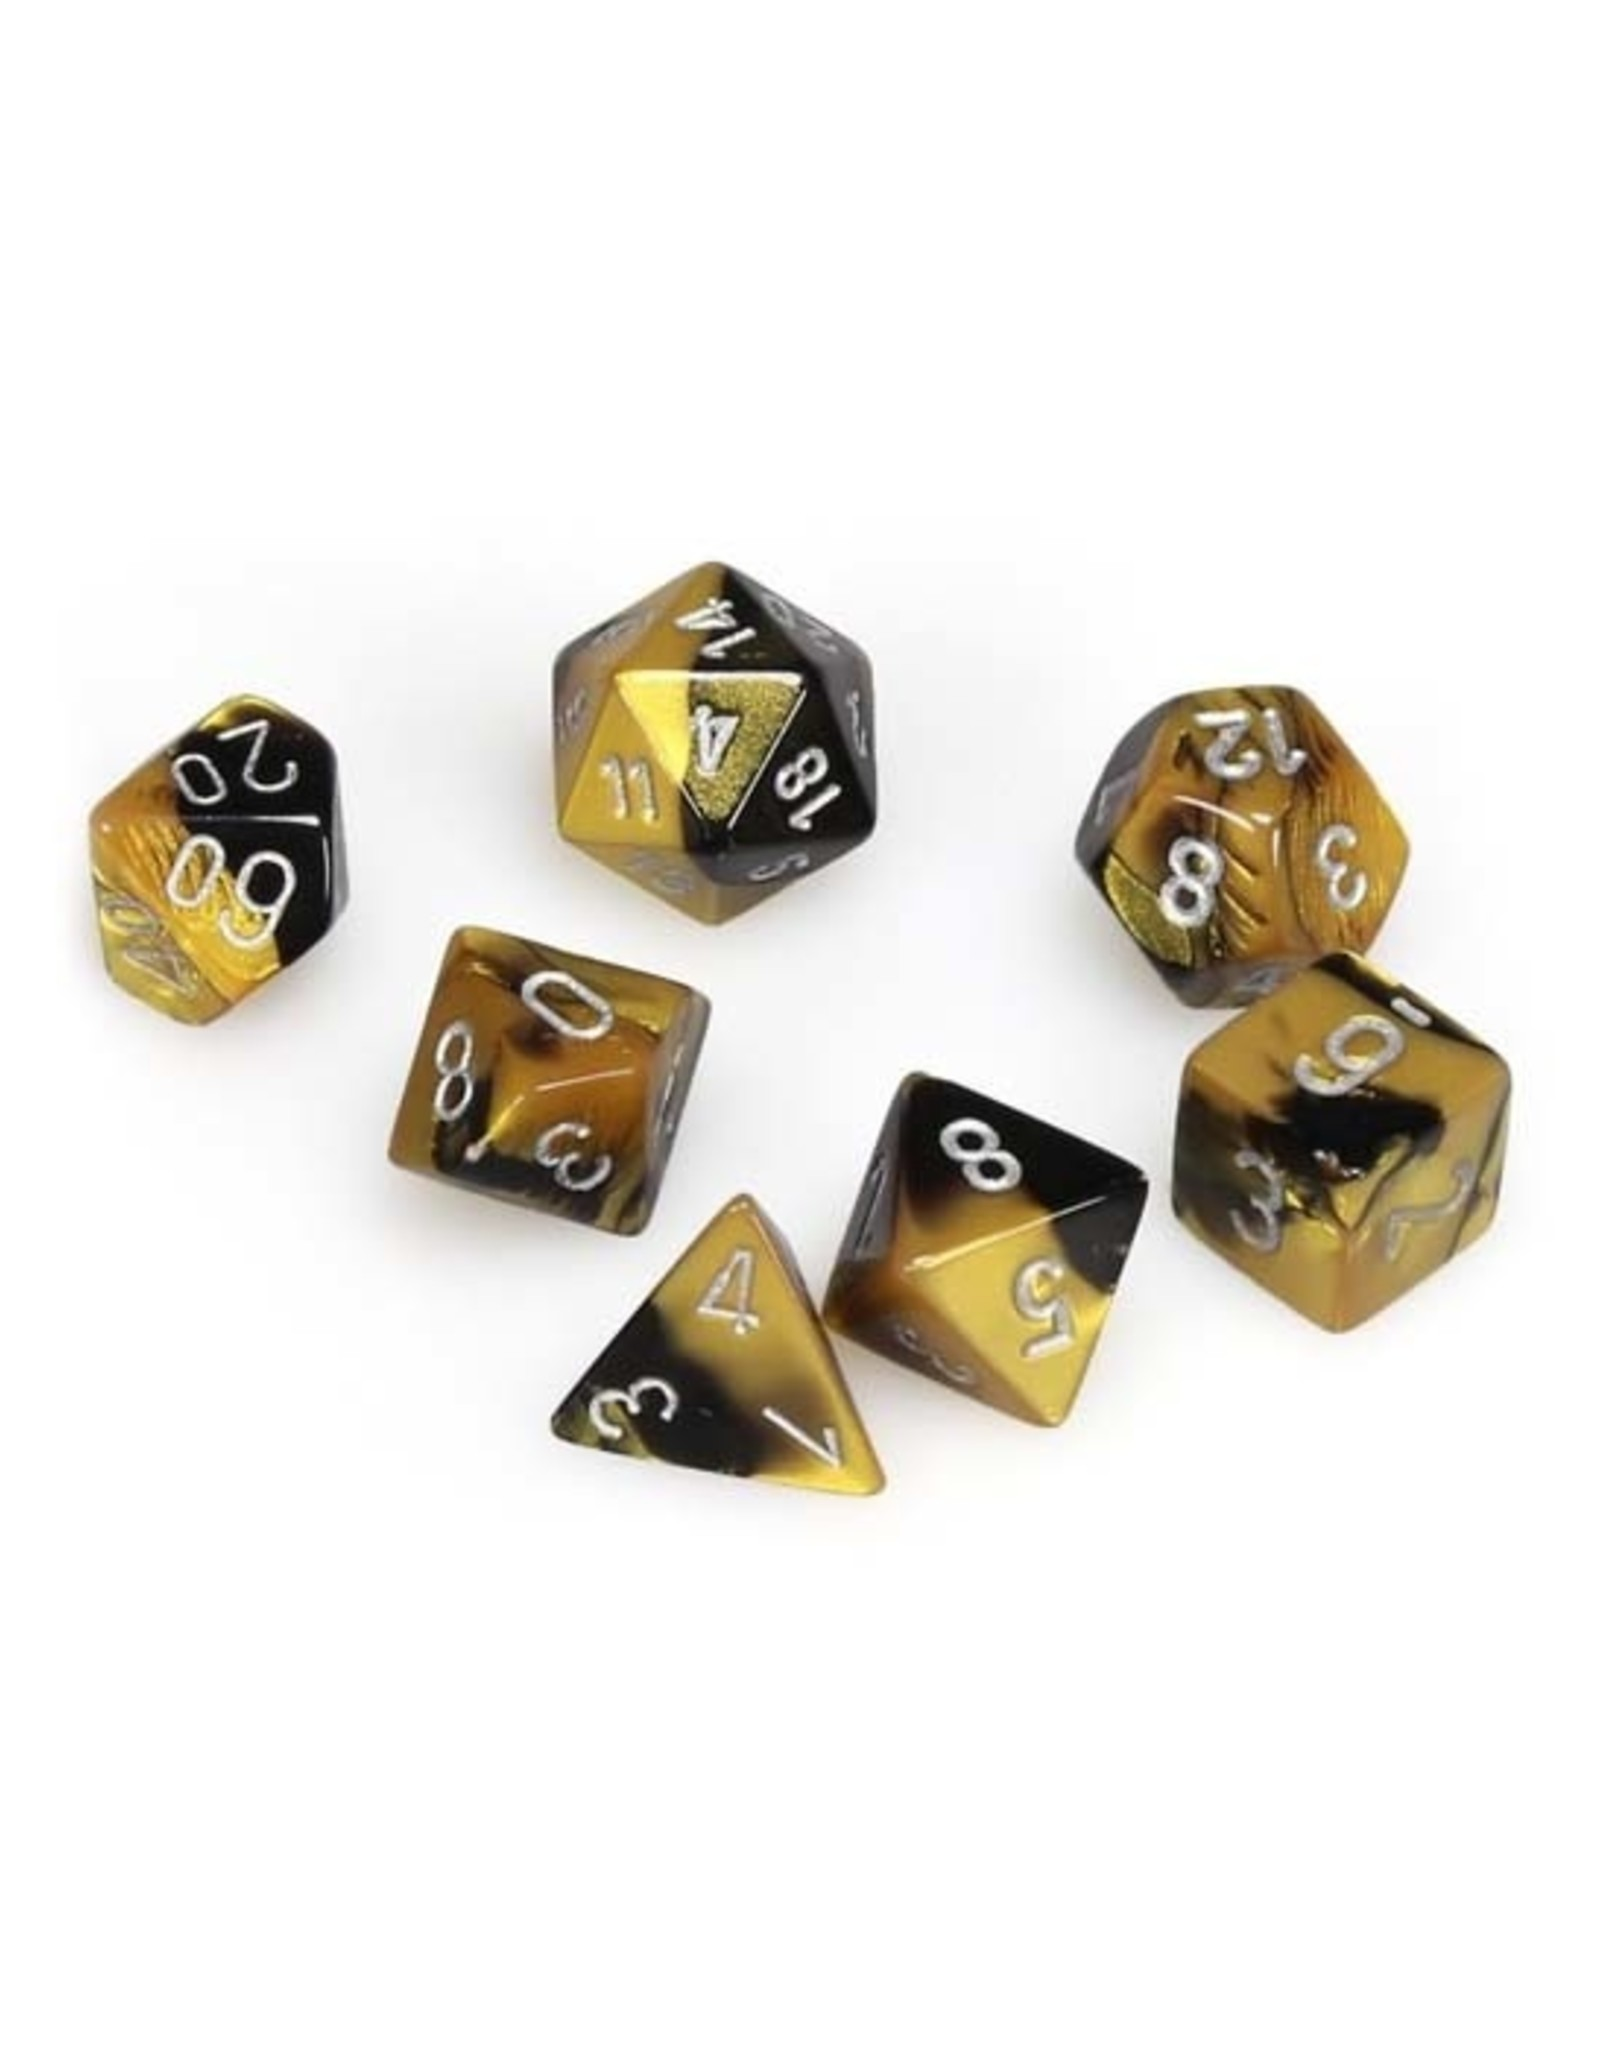 Chessex Chessex: Poly 7 Set - Gemini - Black Gold w/ Silver